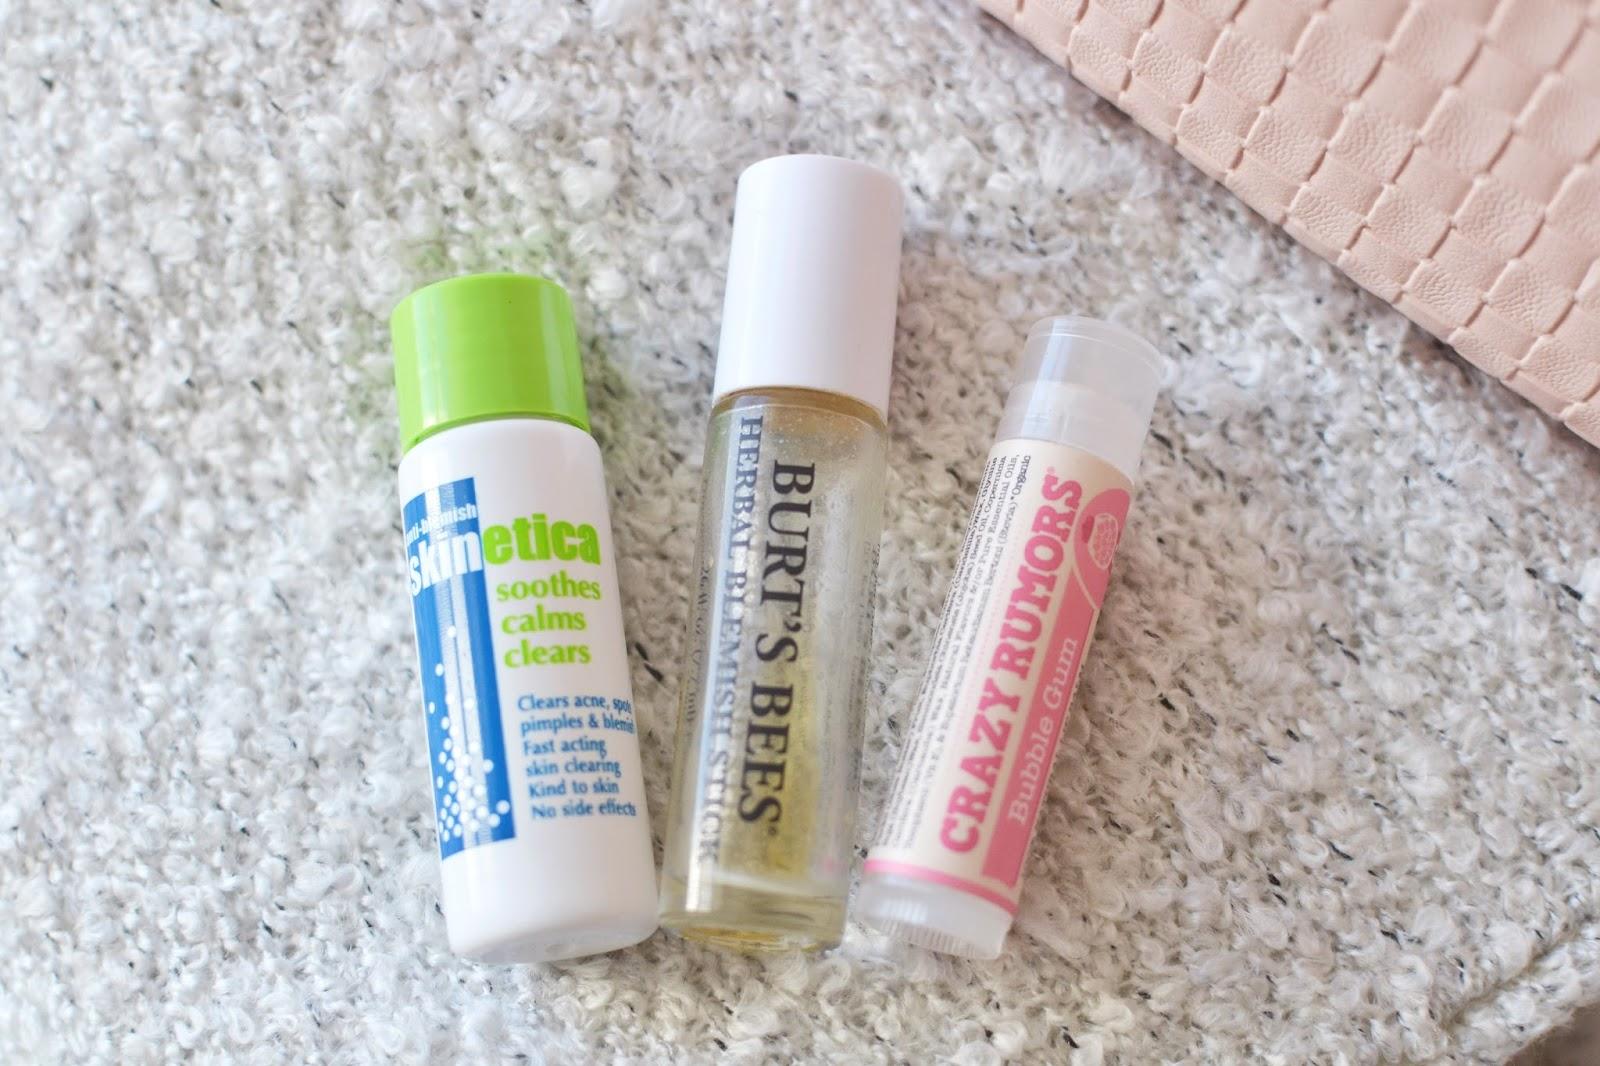 anti-blemish products, spot treatments